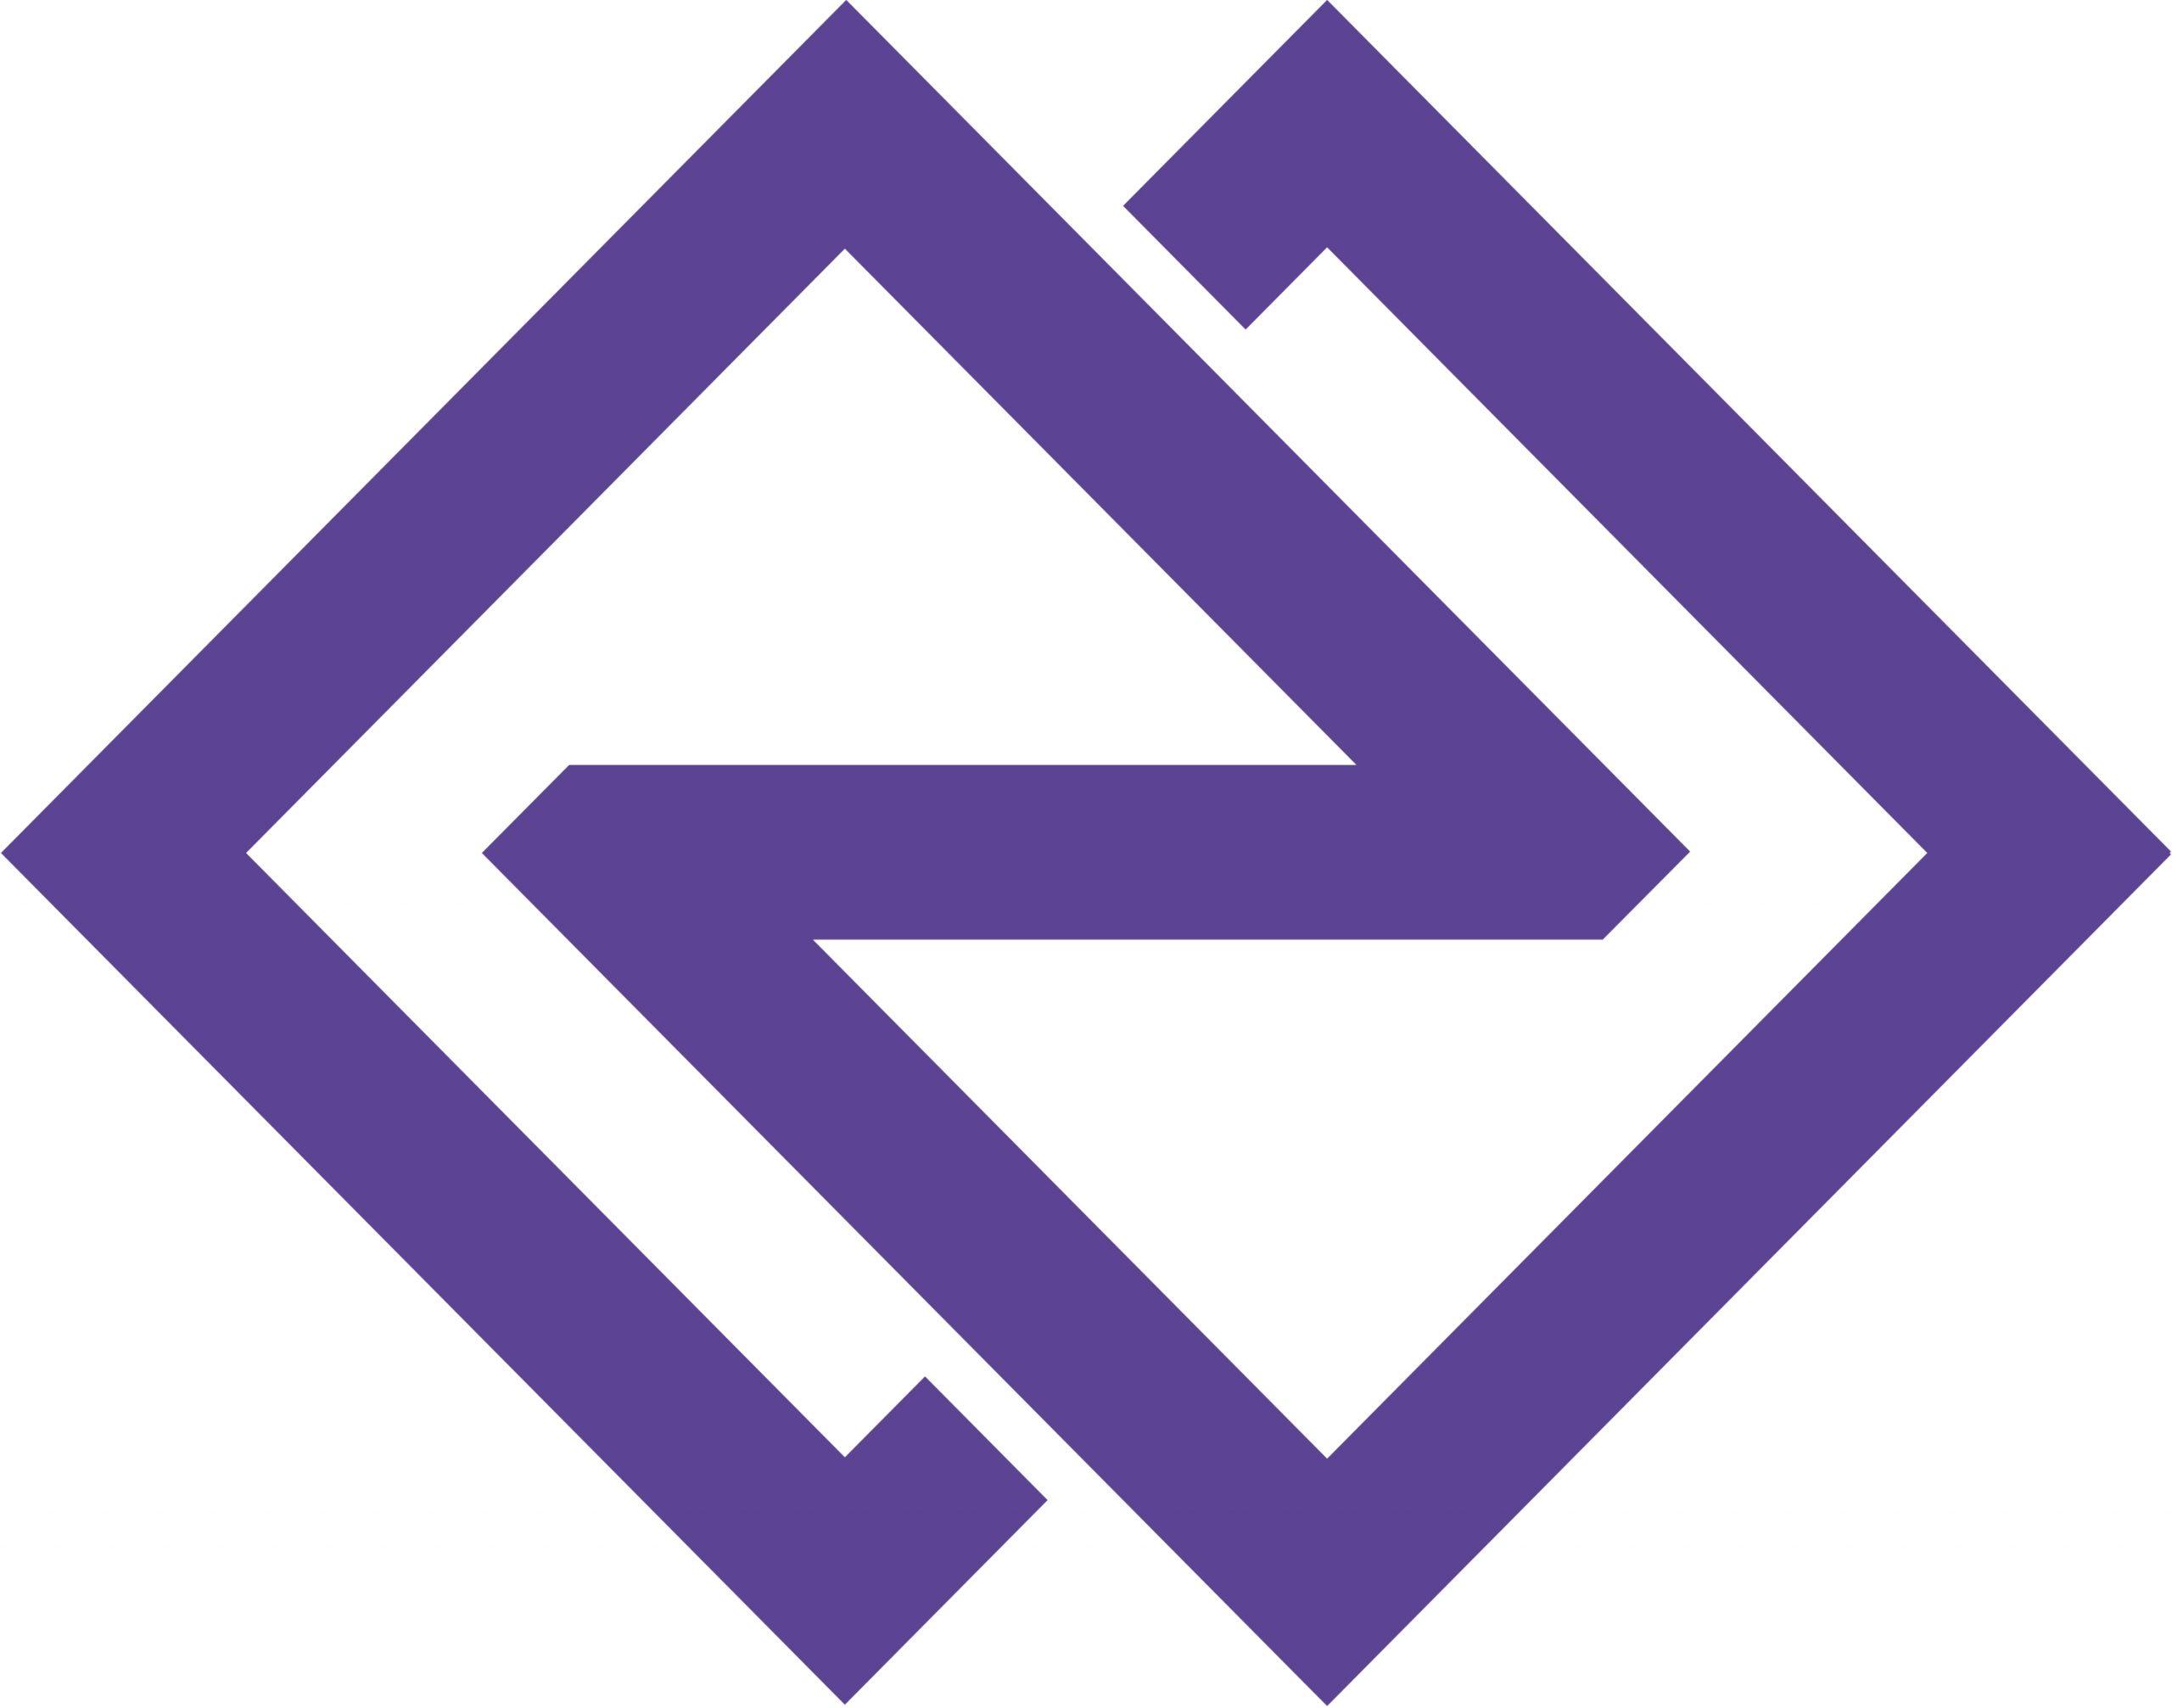 logo-etherevolution-simbolo-pantone-266C